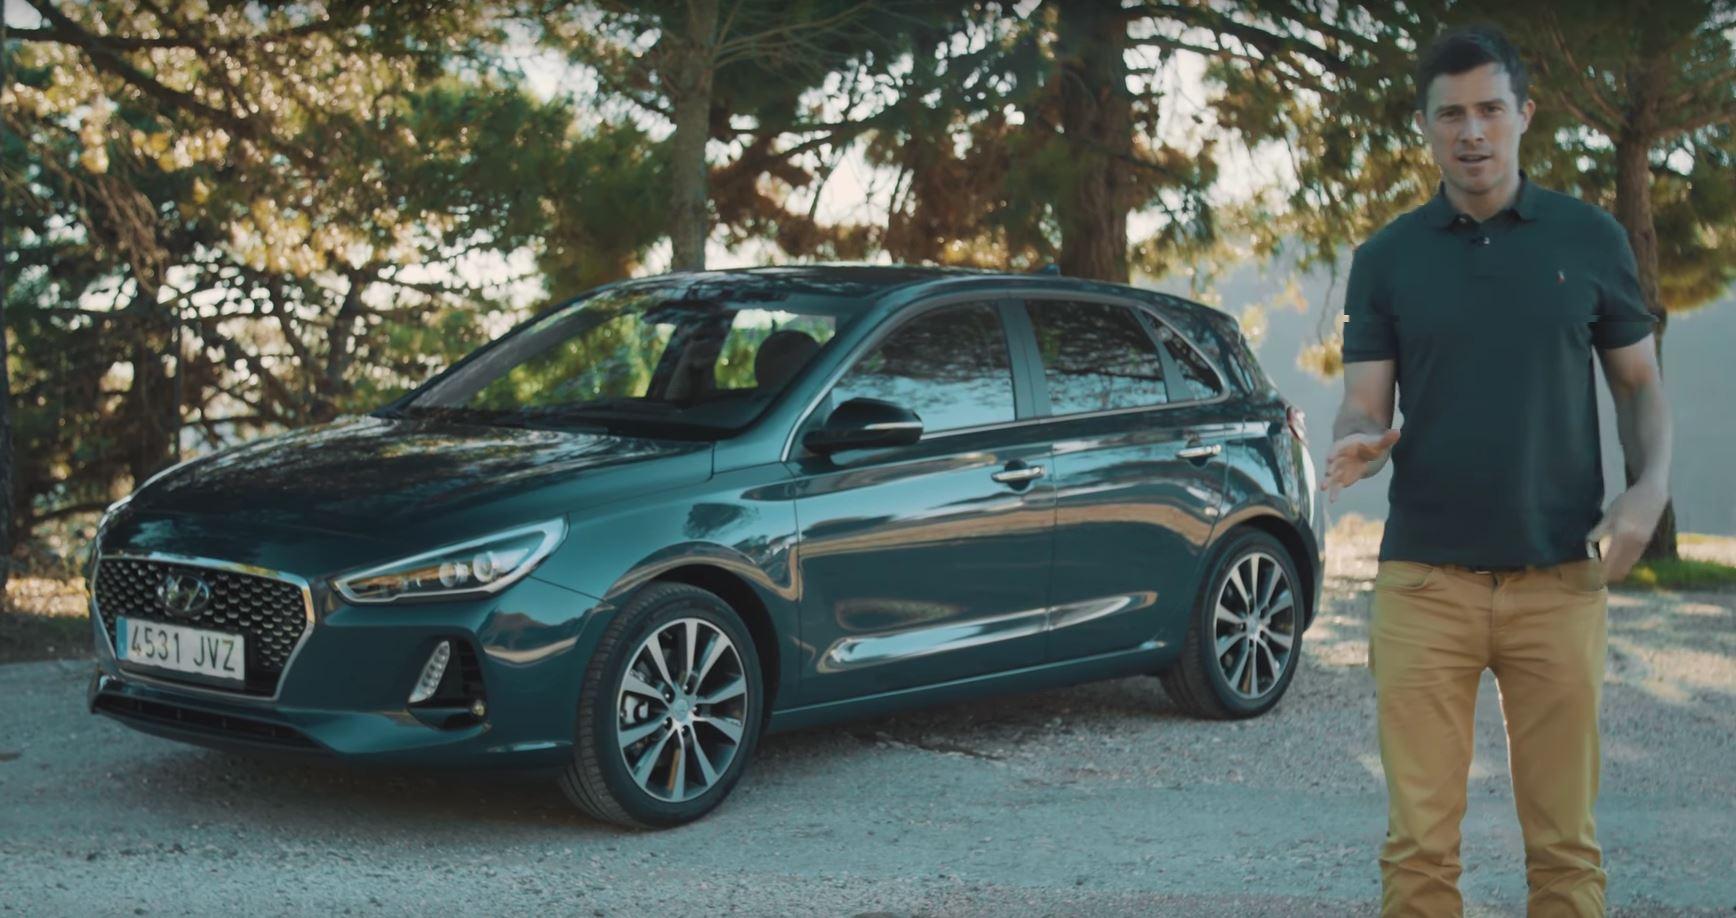 Original 2017 Hyundai I30 Plays The Averages Says First European Review  Autoevolution